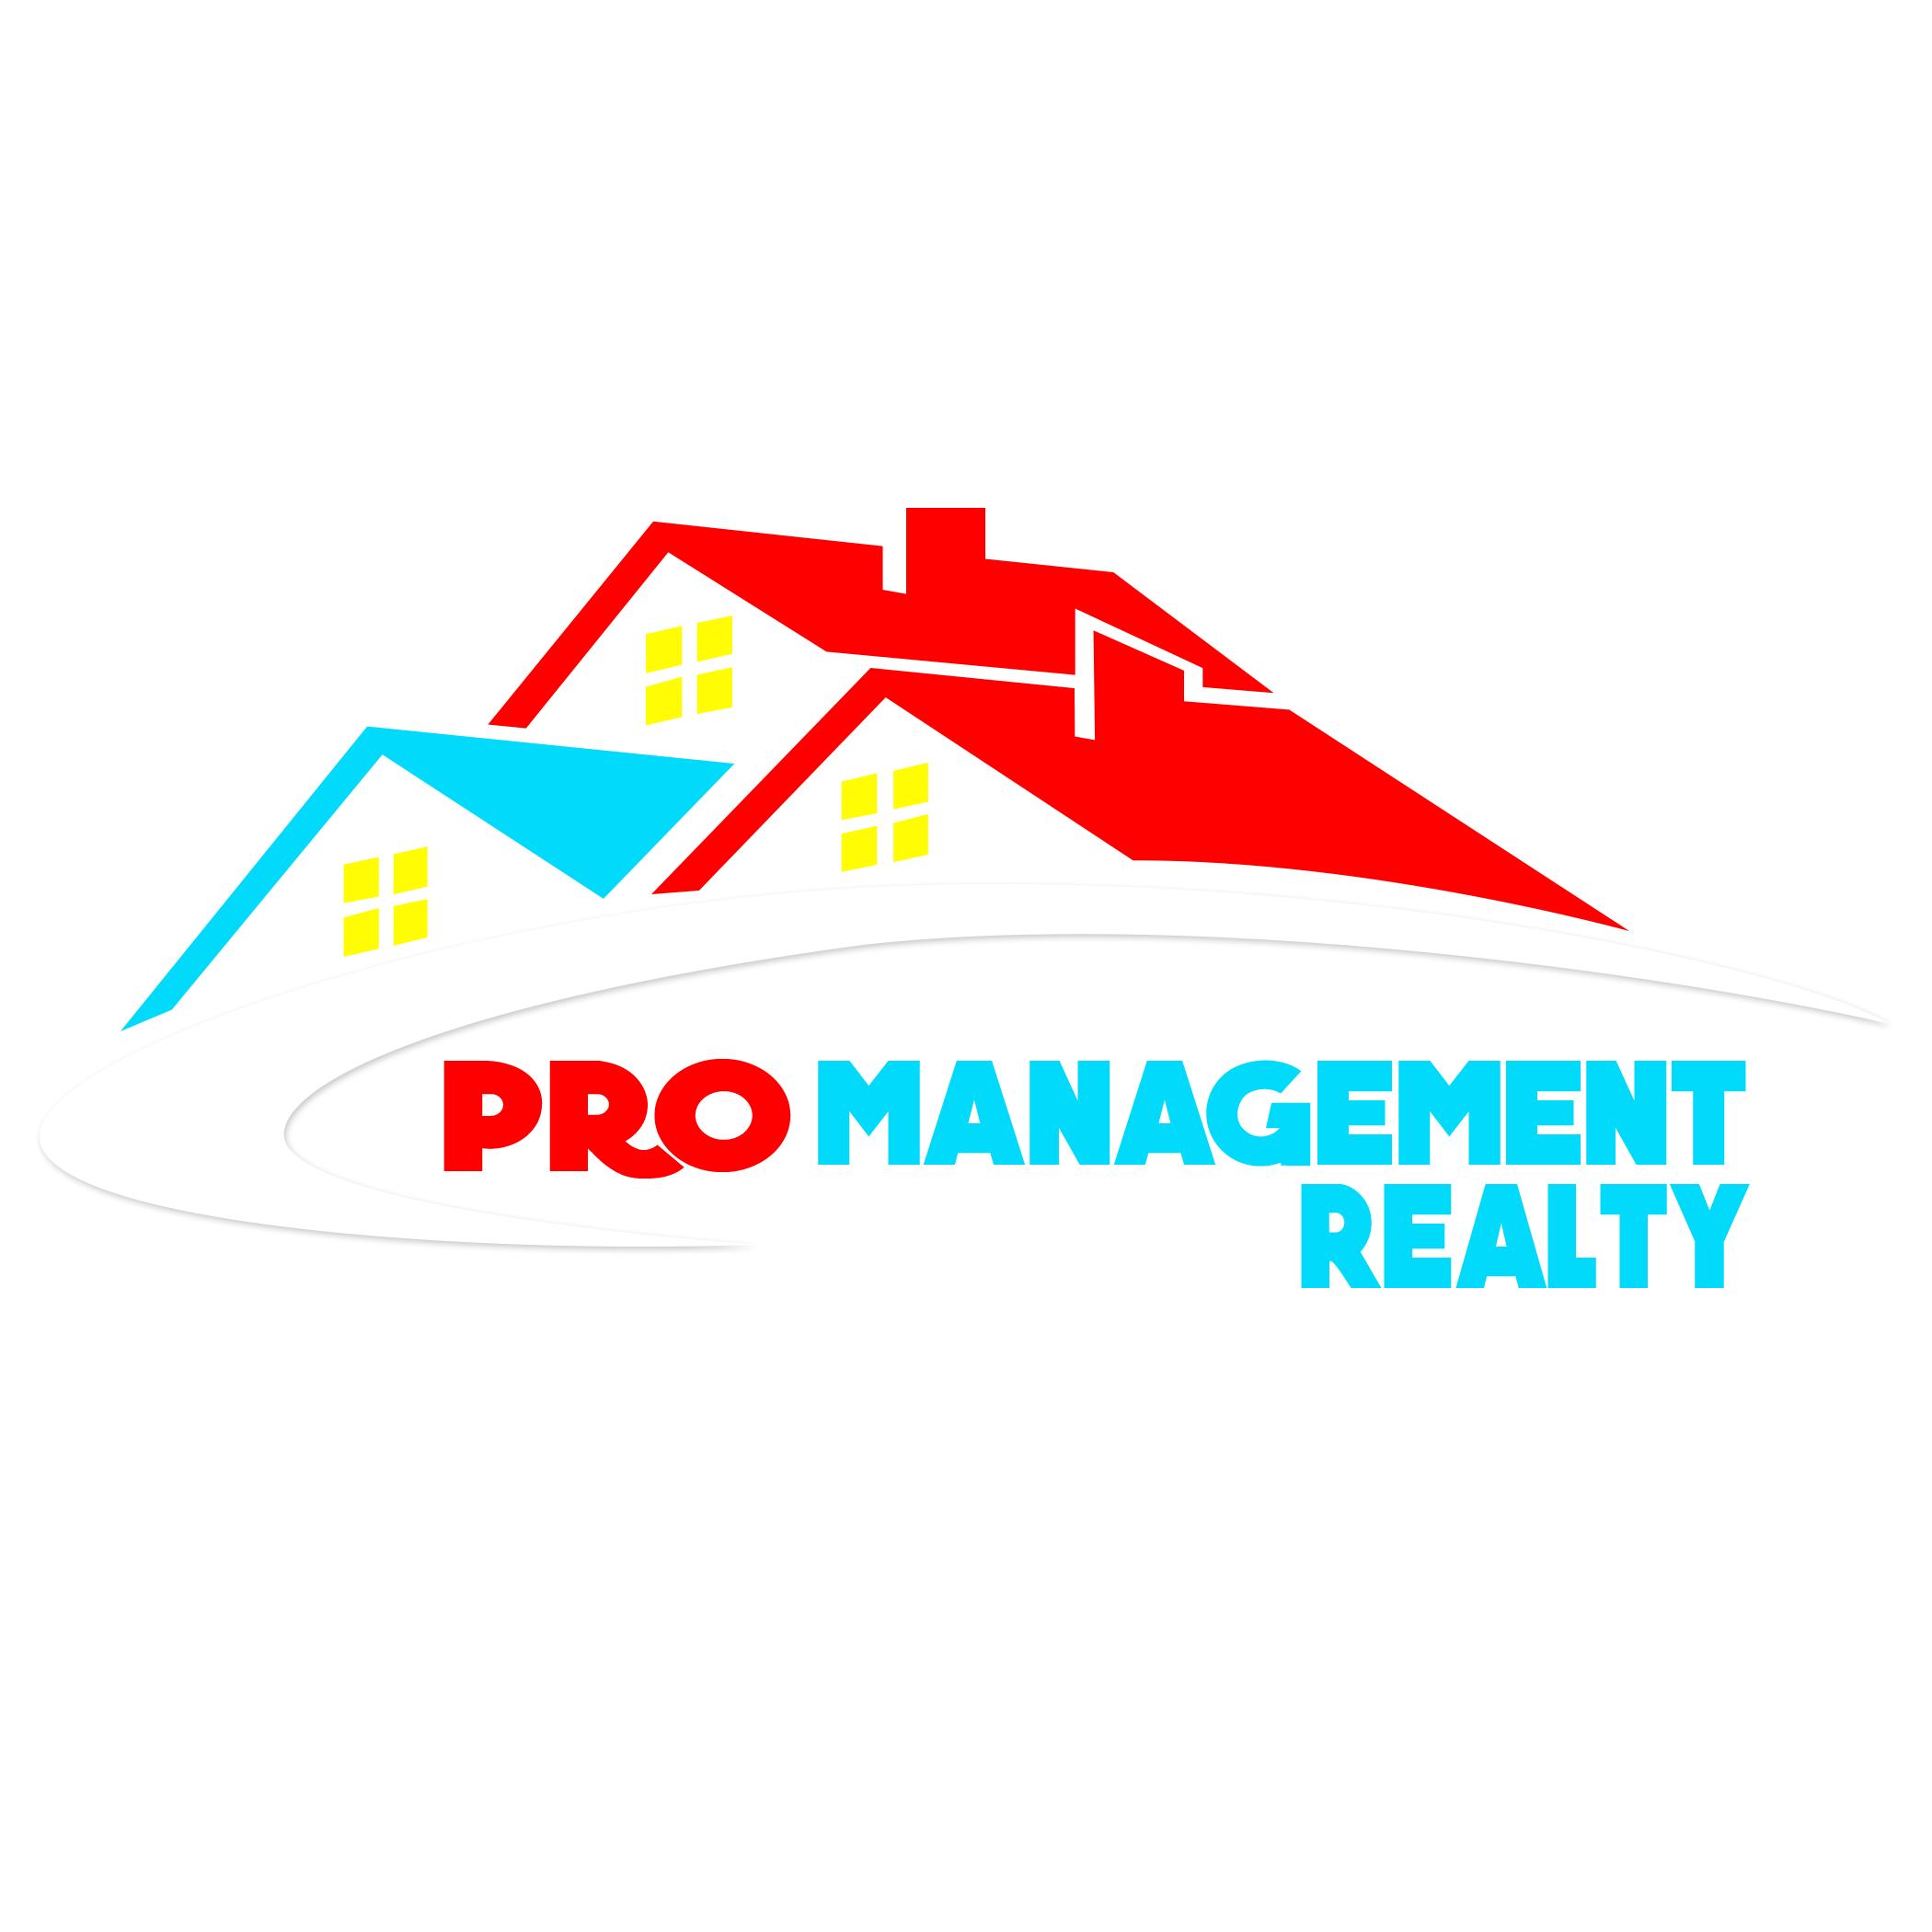 Pro Management Realty LLC